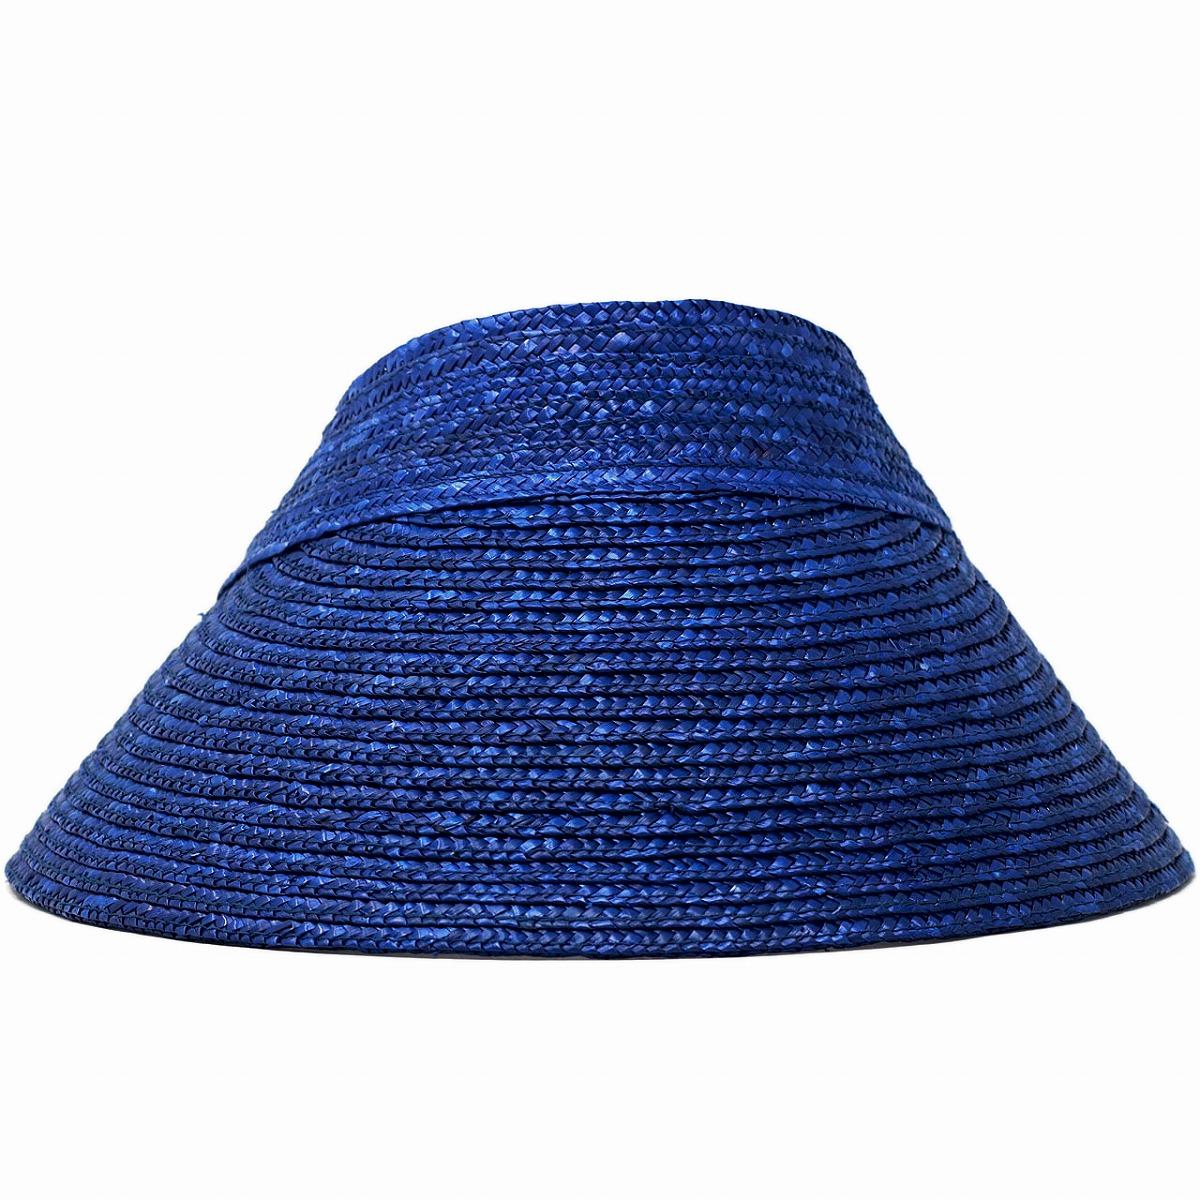 Elehelm Hat Store Visor Cap Ladies Hat Visor Straw Hat